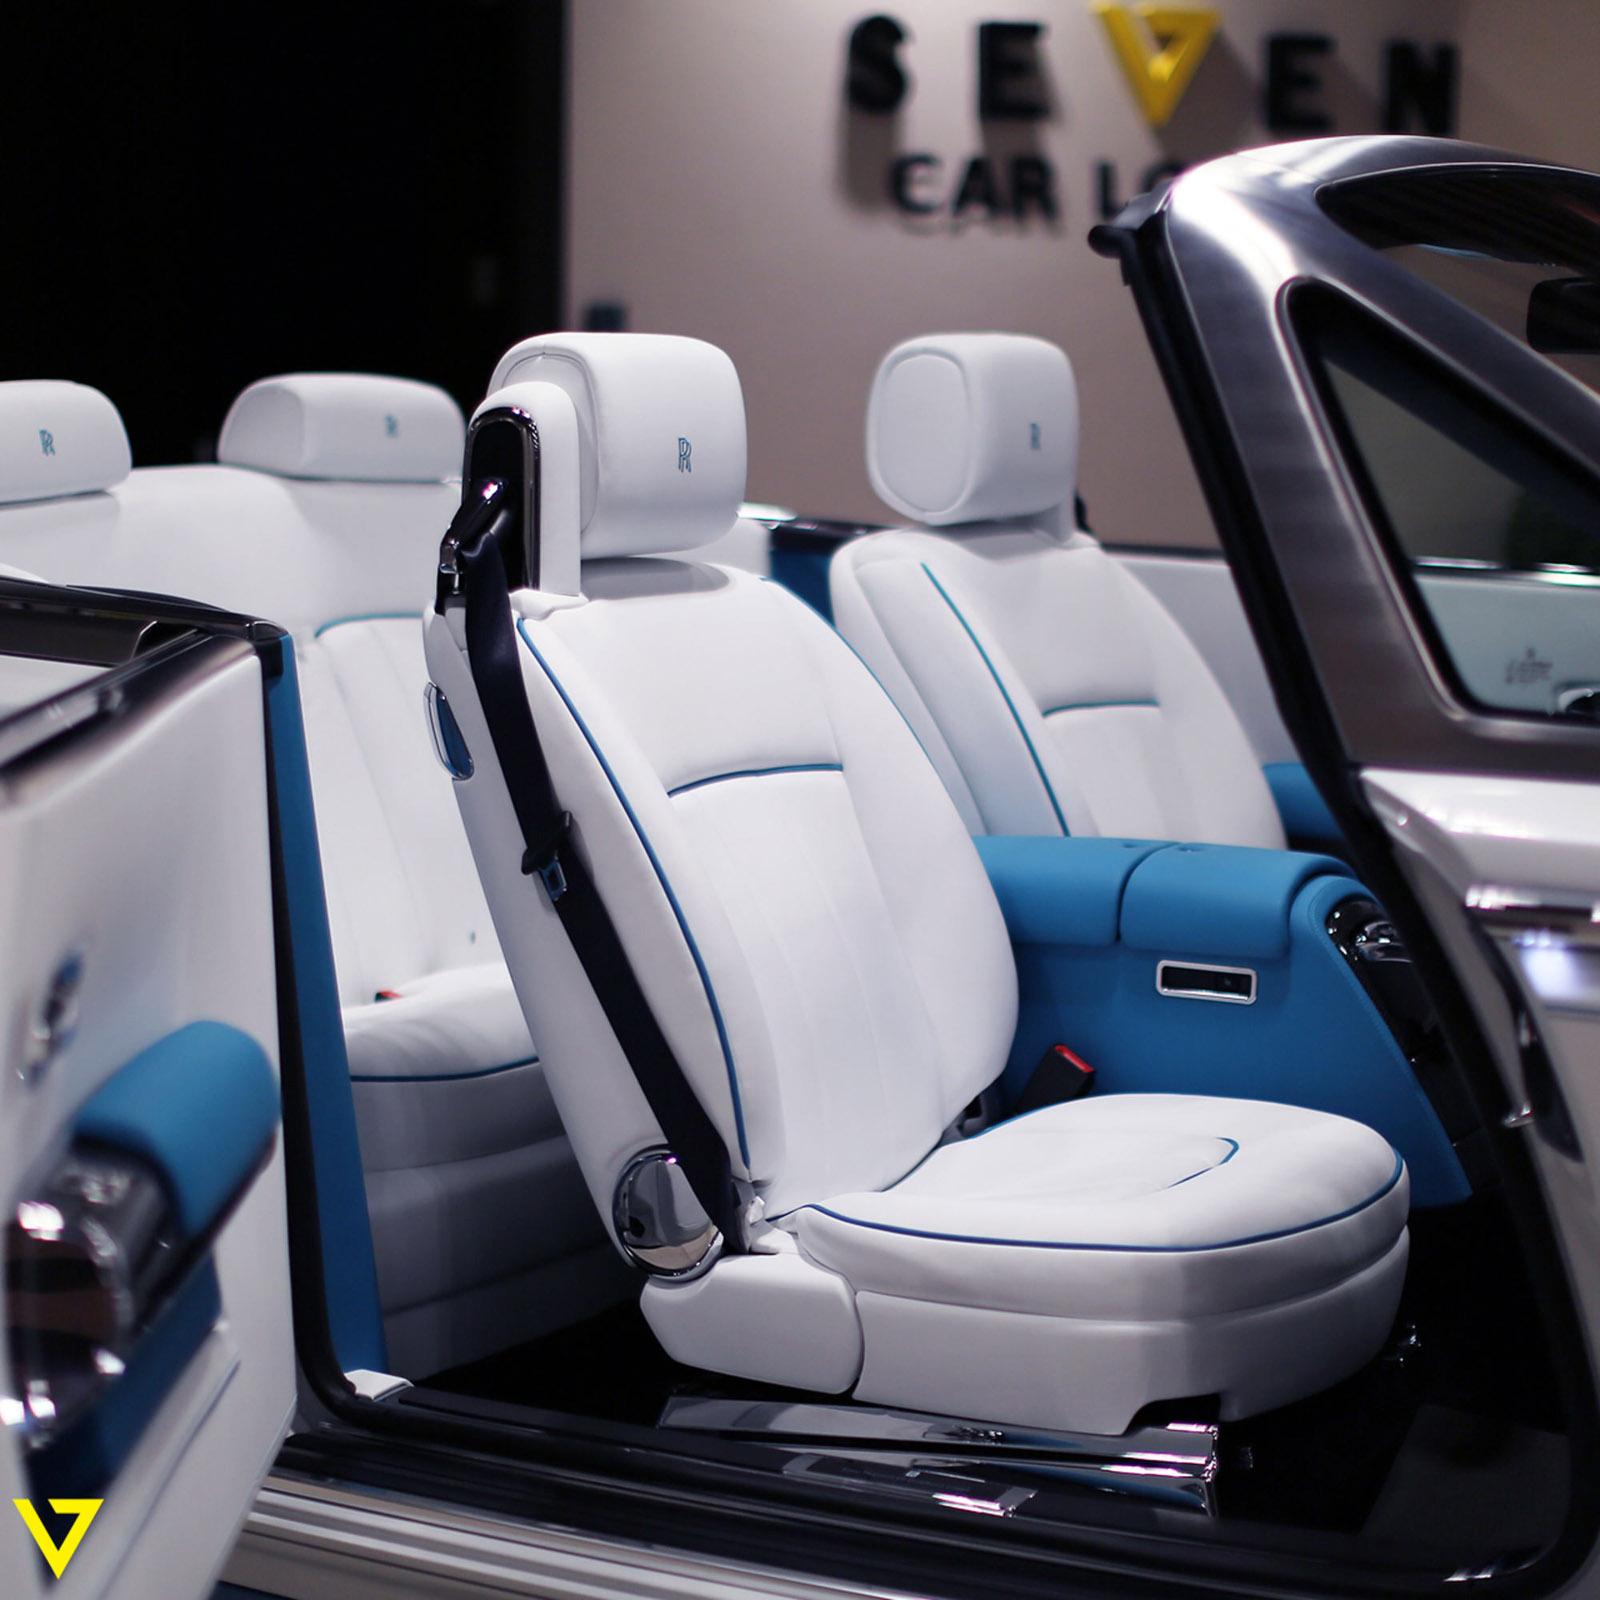 Rolls-Royce_Phantom_Drophead_Coupe_Last-of-Last_edition_13